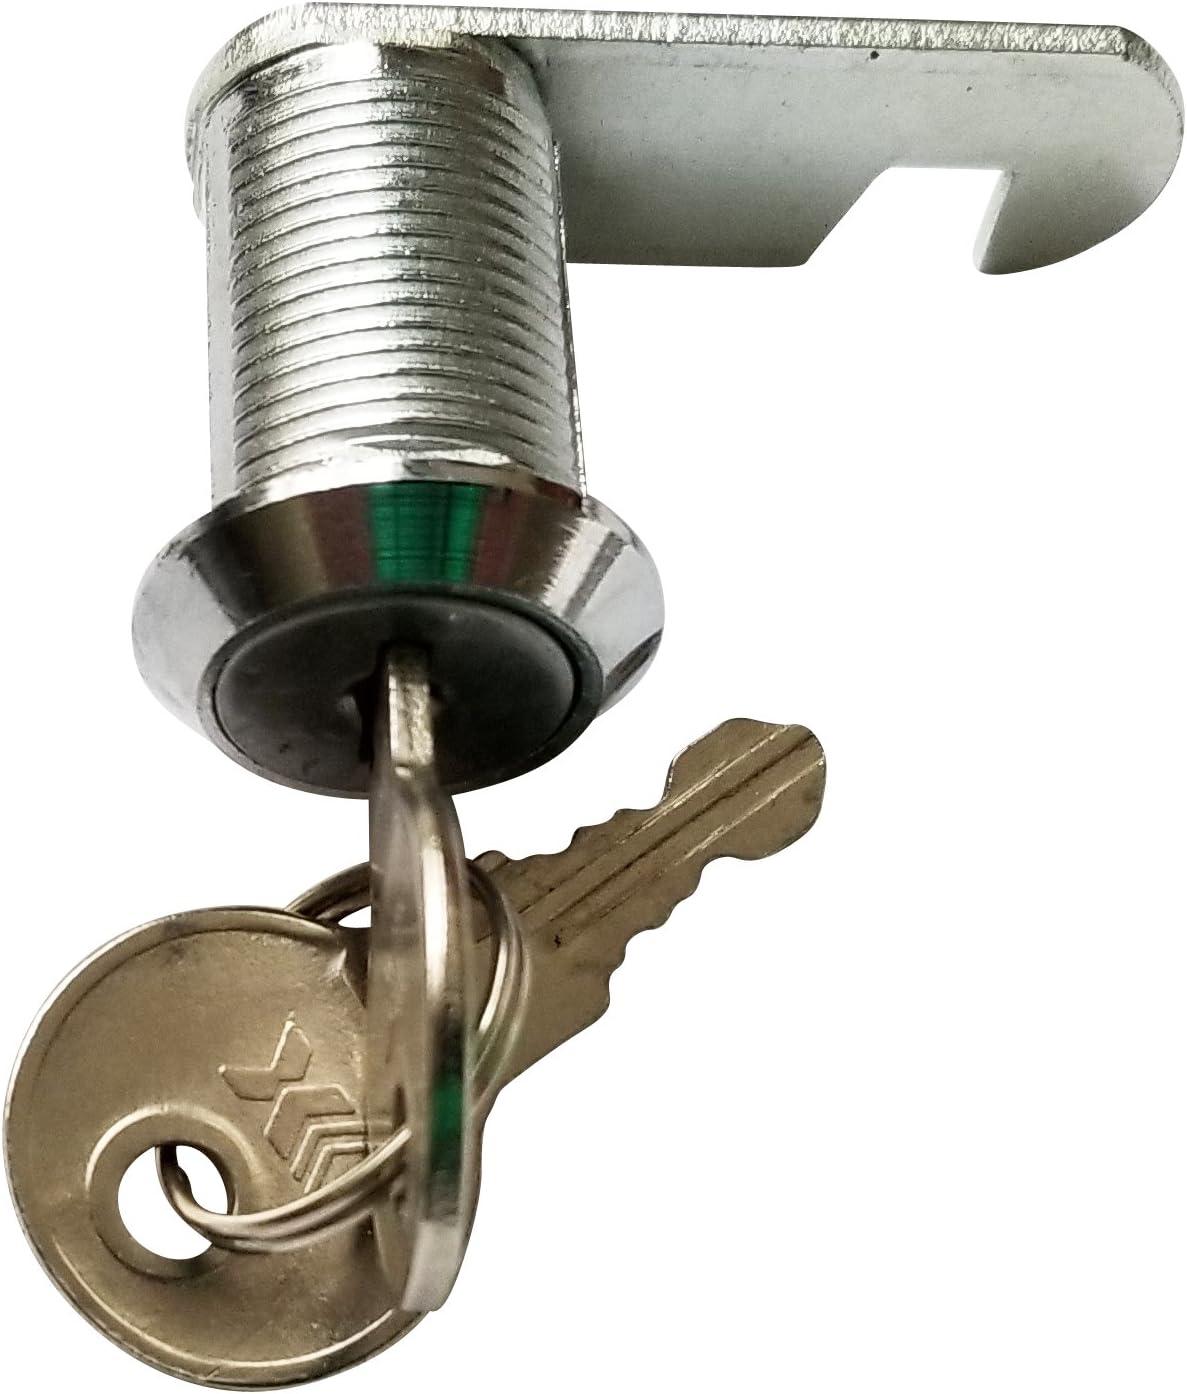 Admiral Flat Key Cam Lock (7/8 Inch, Pack of 1)